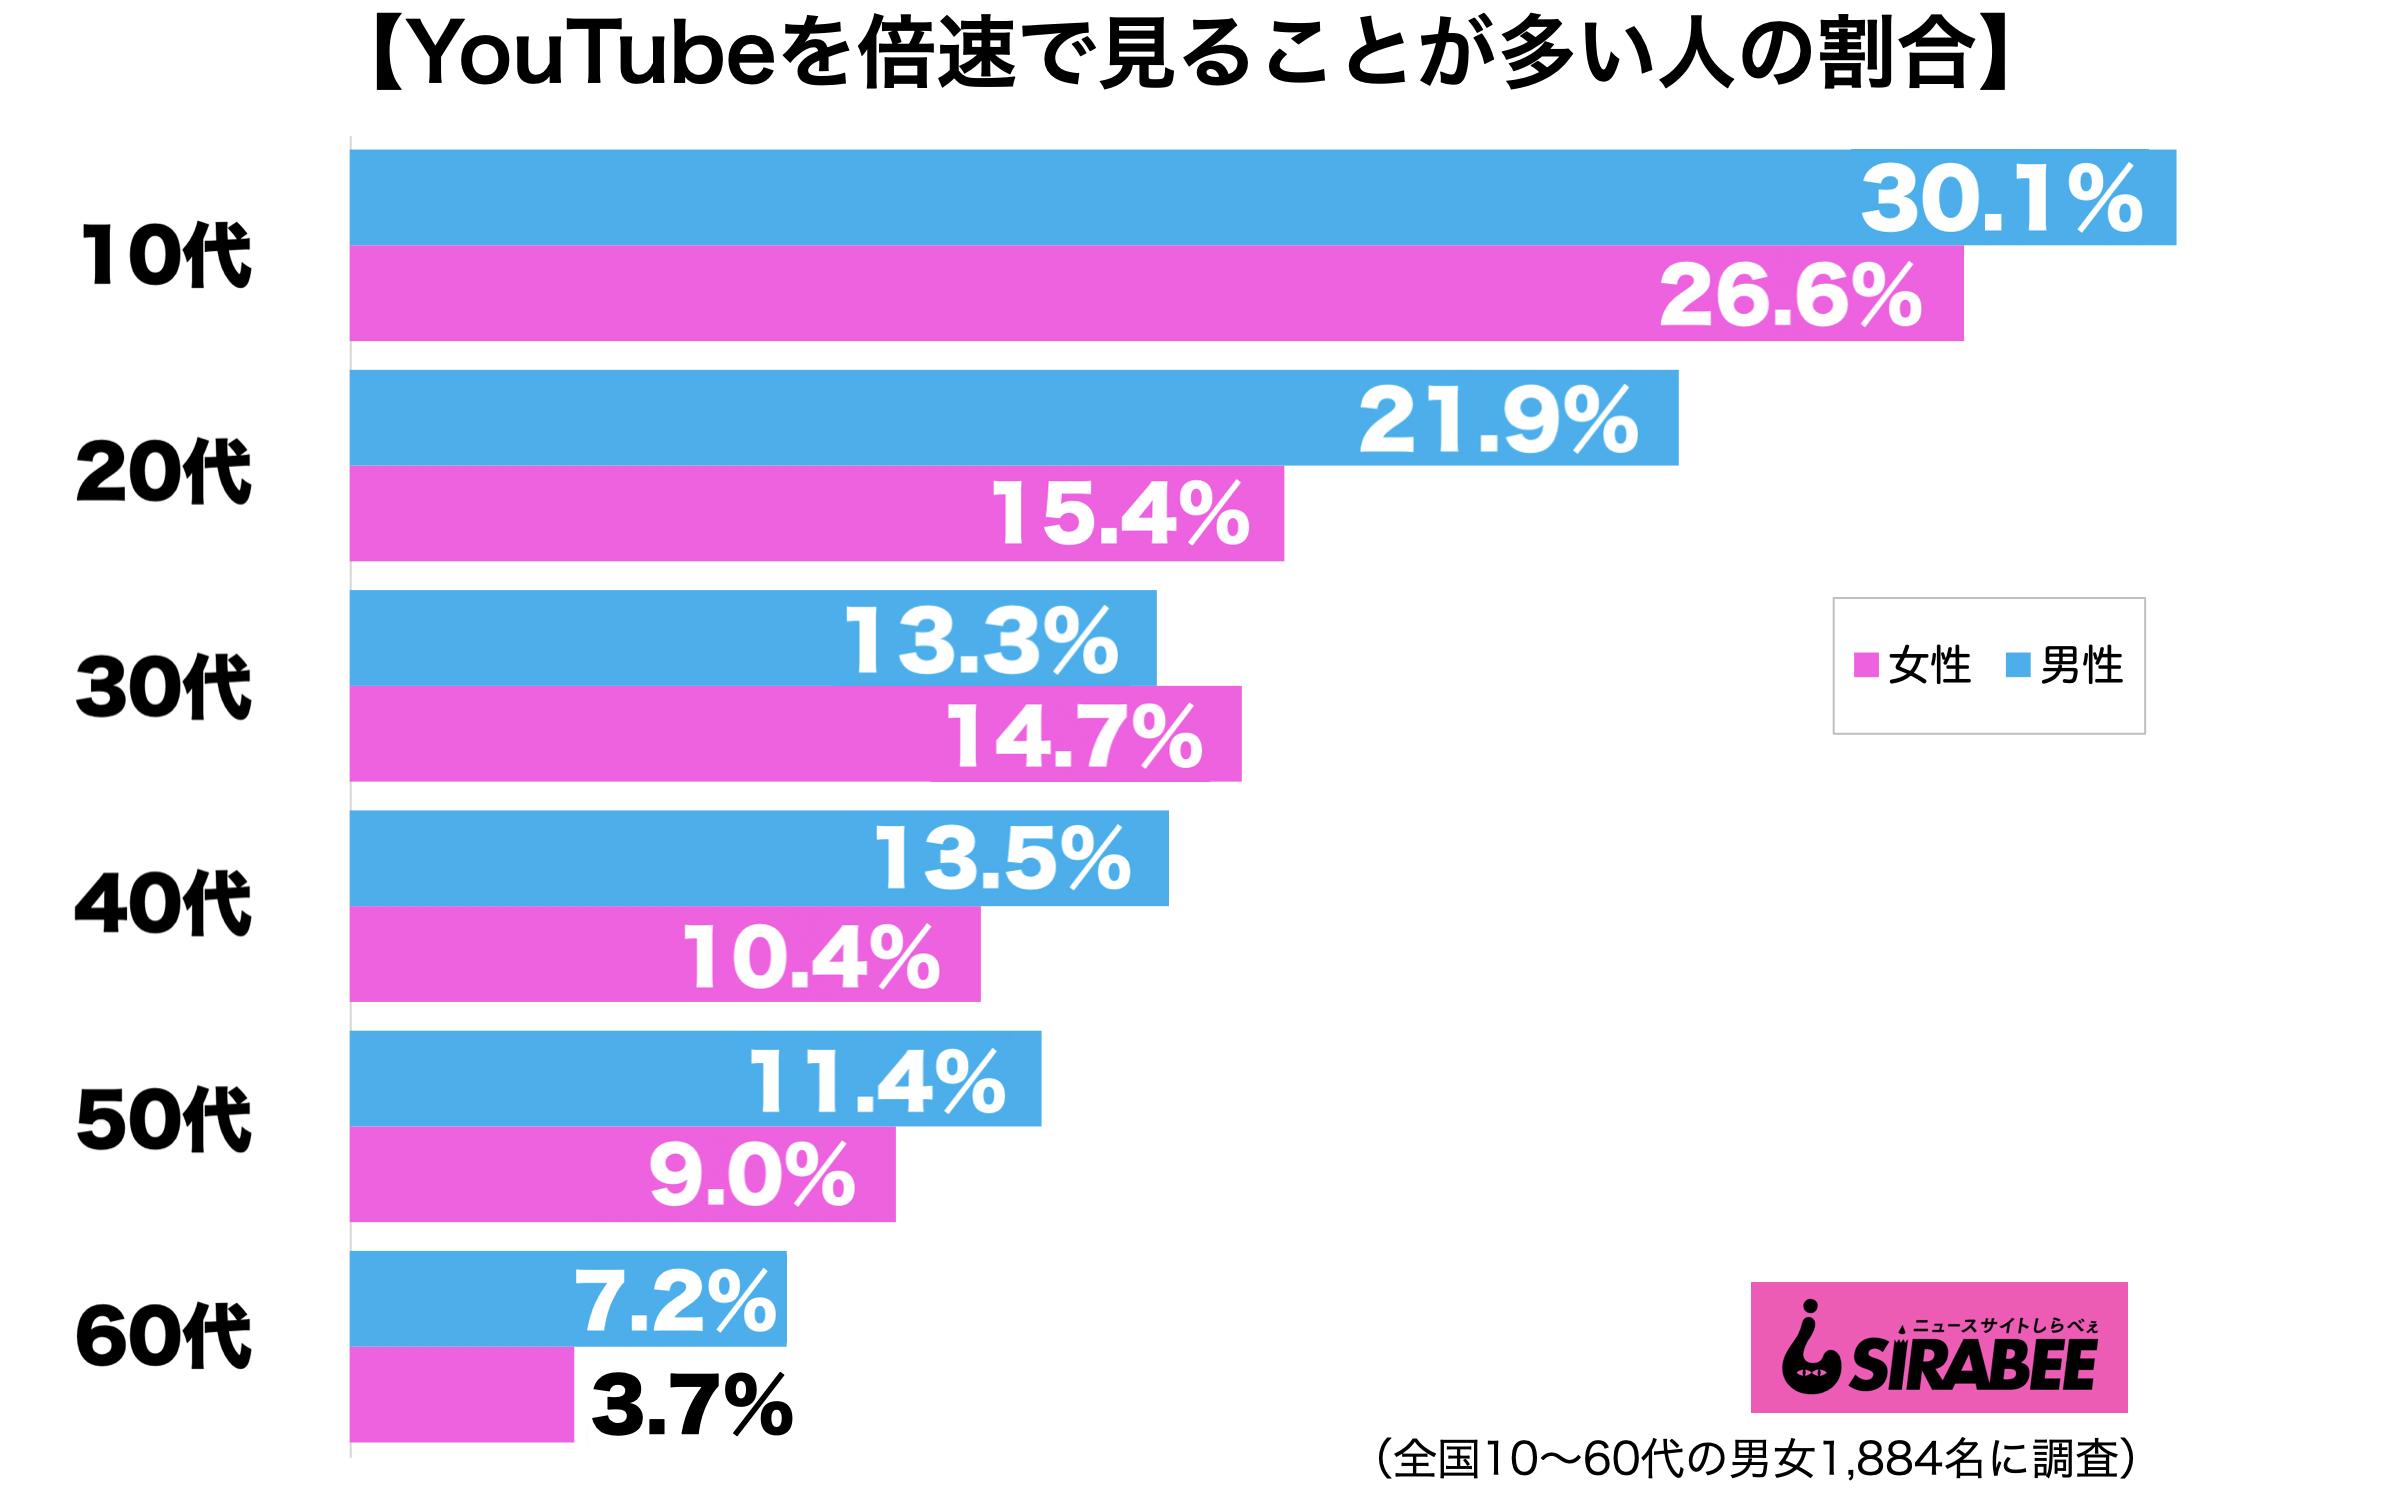 YouTubeを倍速で見る人の割合